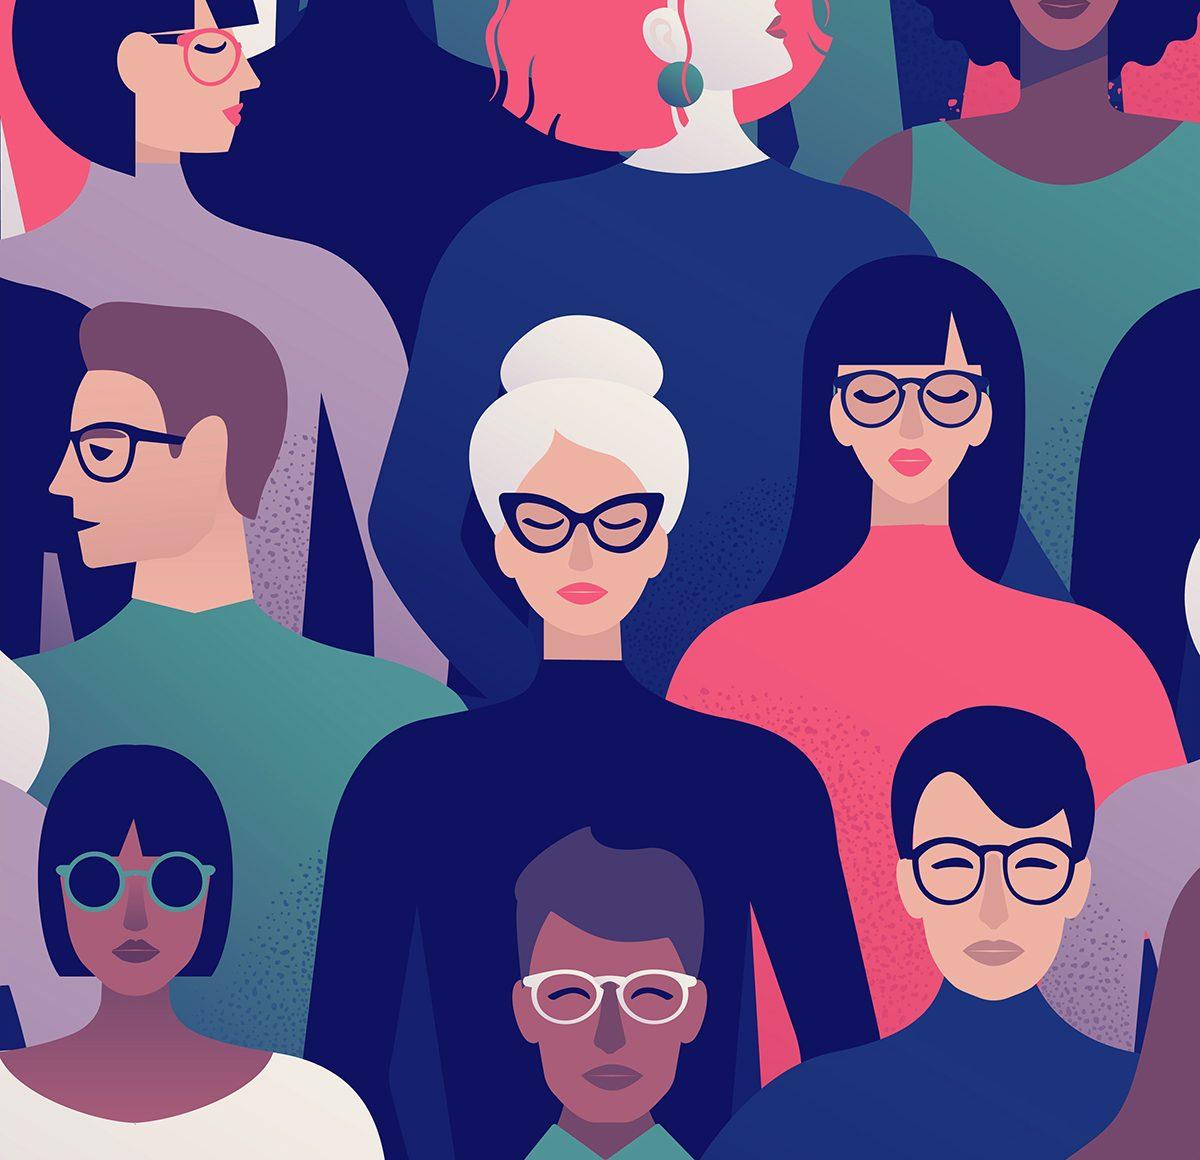 femmes de science dossier INRS recherche